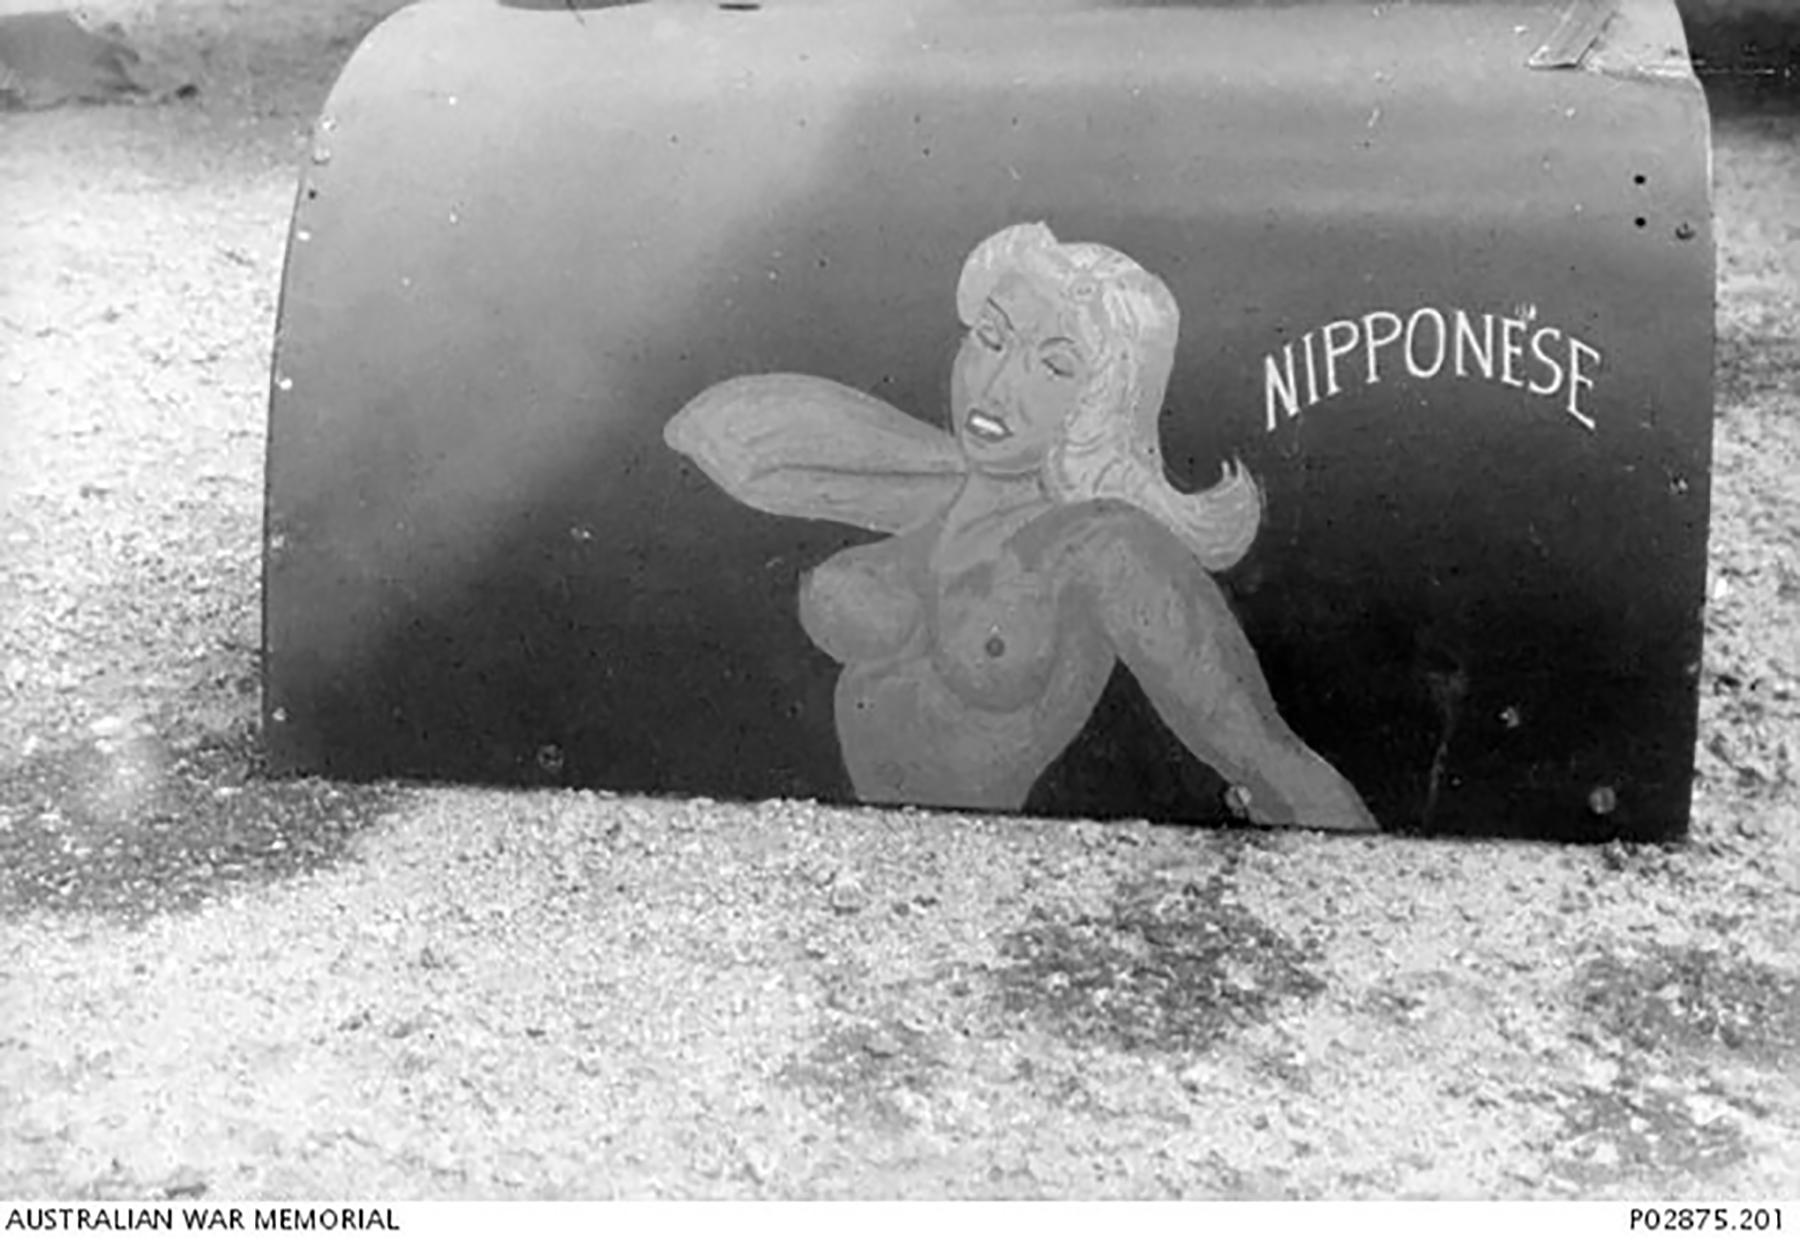 Spitfire MkVc RAAF 79Sqn Nipponese nose art at Kiriwina Trobriand Islands PNG Sep 1943 IWM 01